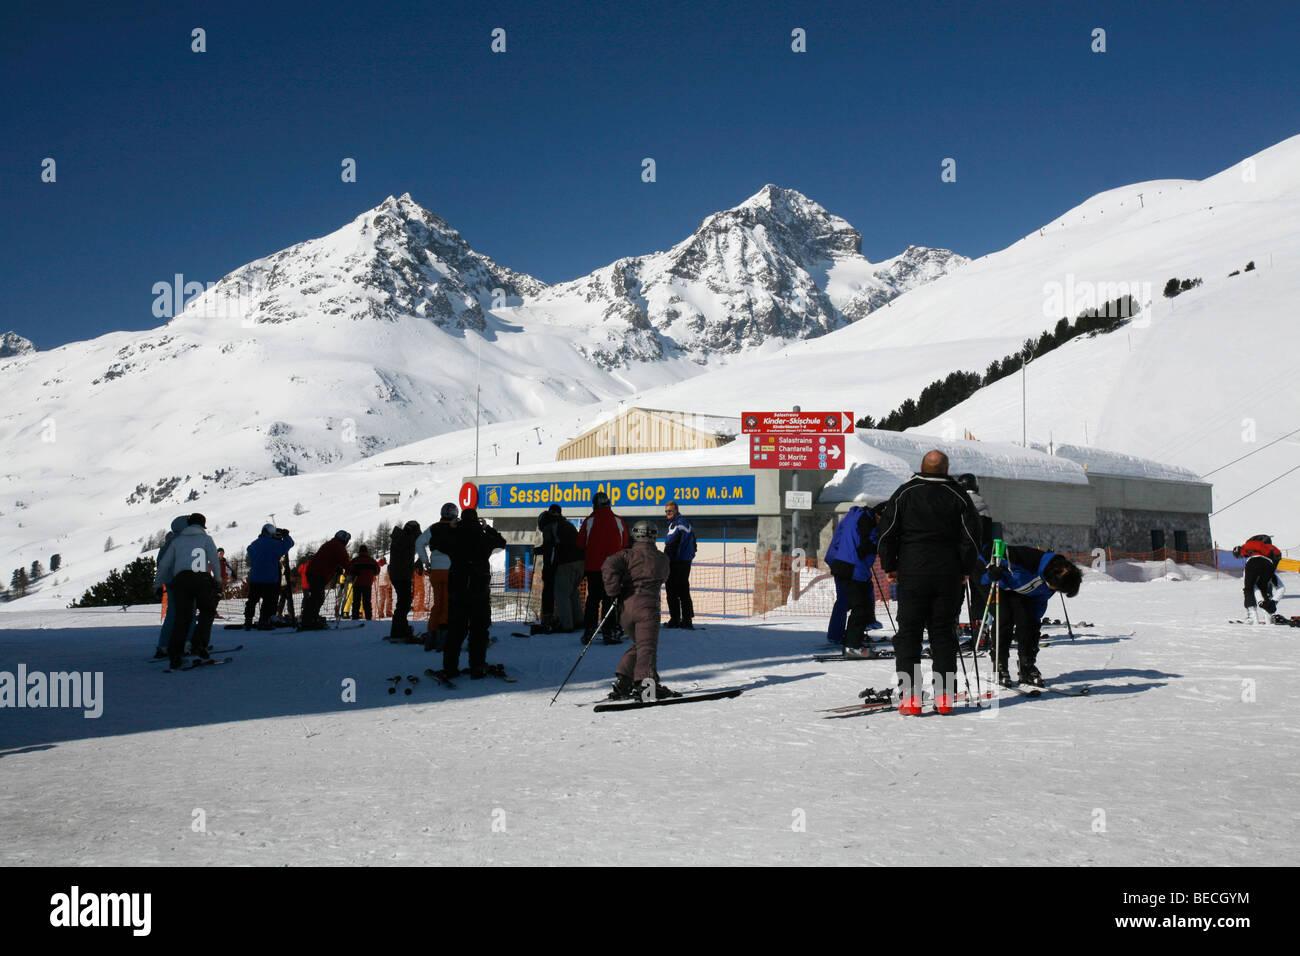 Skiiing, winter sport on the Giop alp, St. Moritz, Oberengadin, Graubuenden, Switzerland - Stock Image